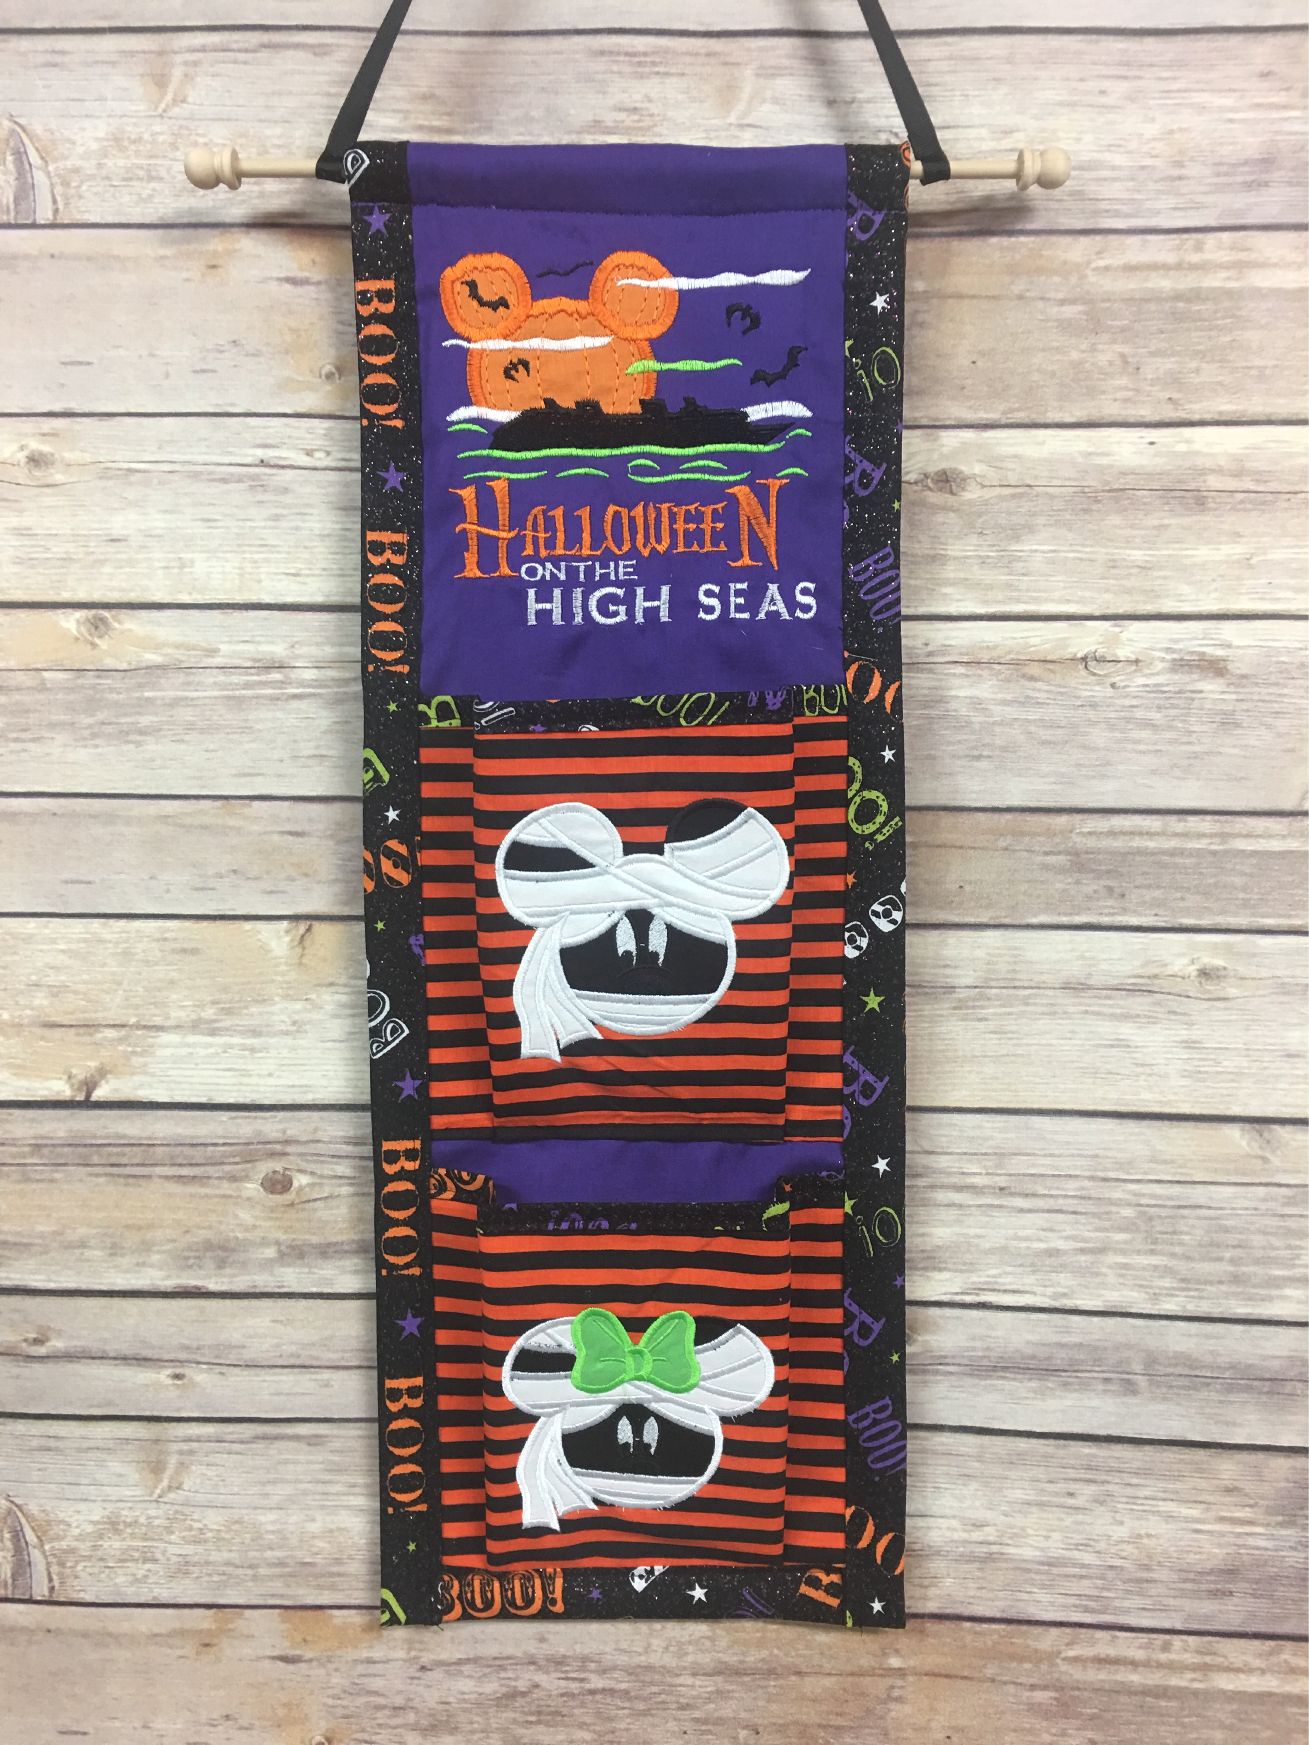 Halloween Disney High Seas Black And White 2020 Halloween Logo Stitches & Tutus   Disney crafts, Fish extender, Fe gifts